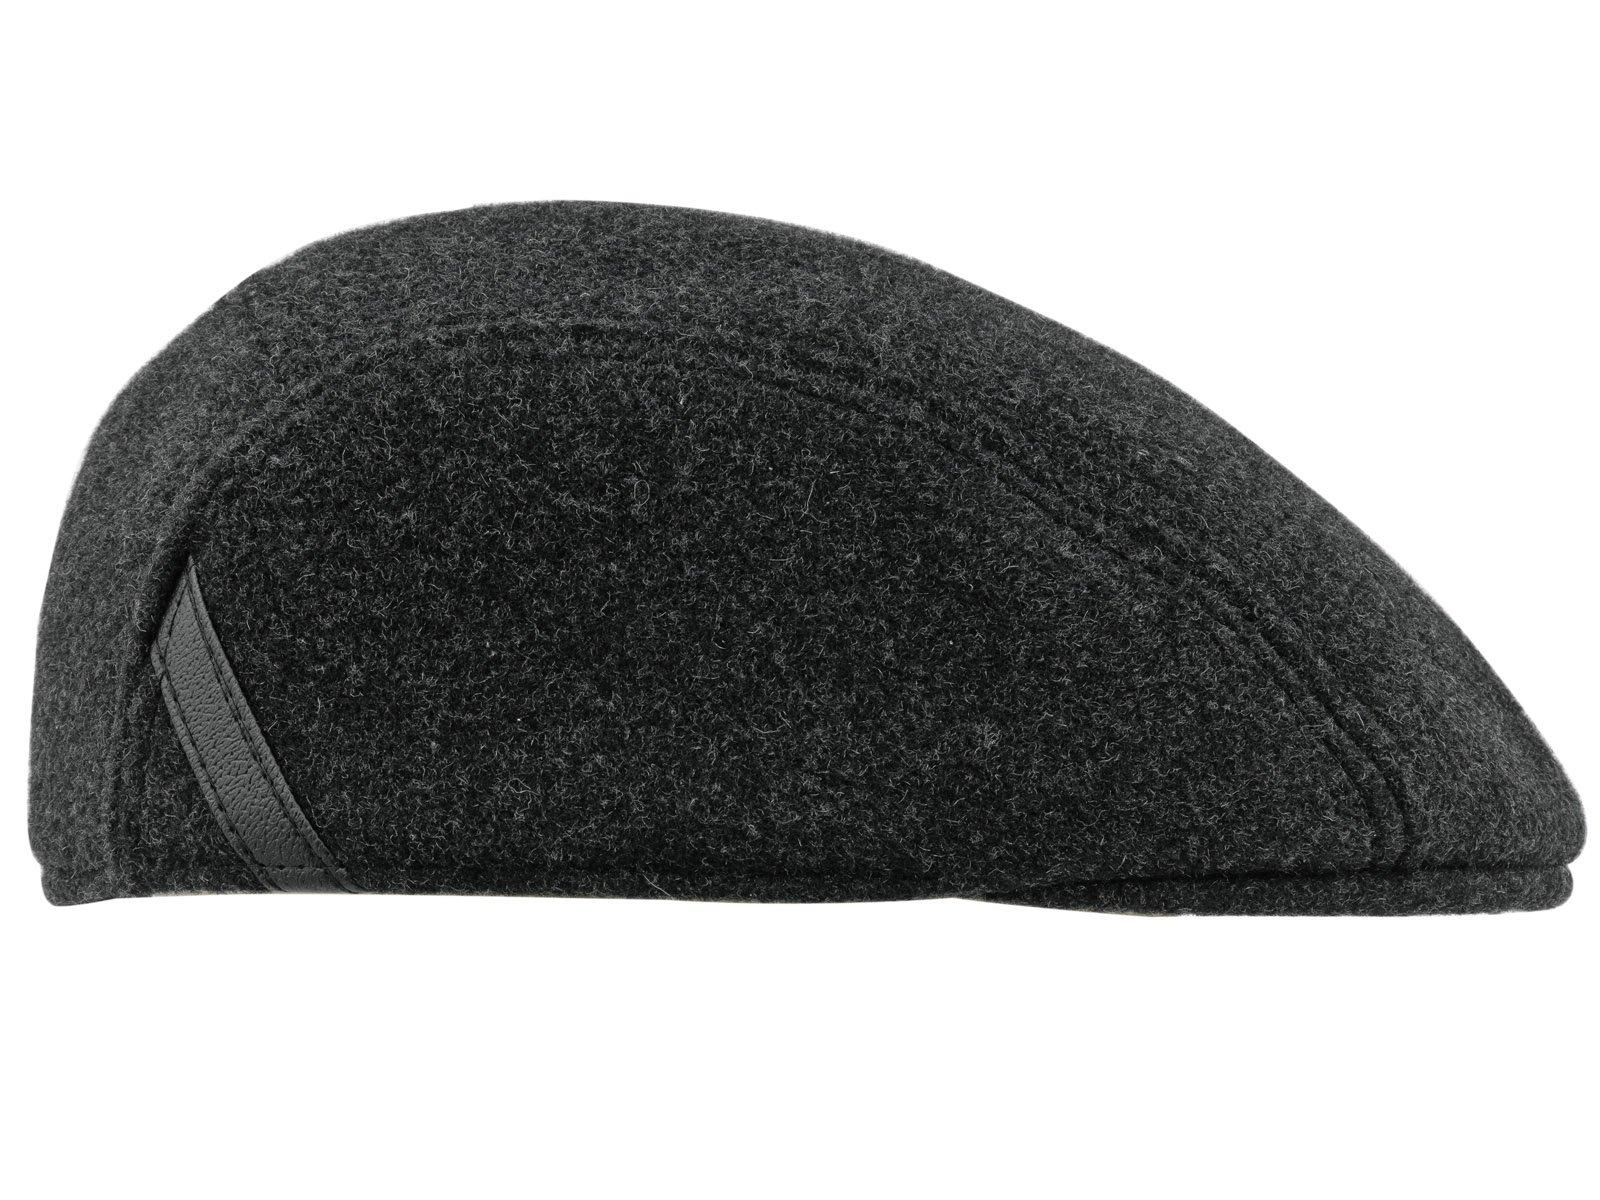 Sterkowski Warm Wool Blend Petersham Ivy League Flat Cap with Earflap